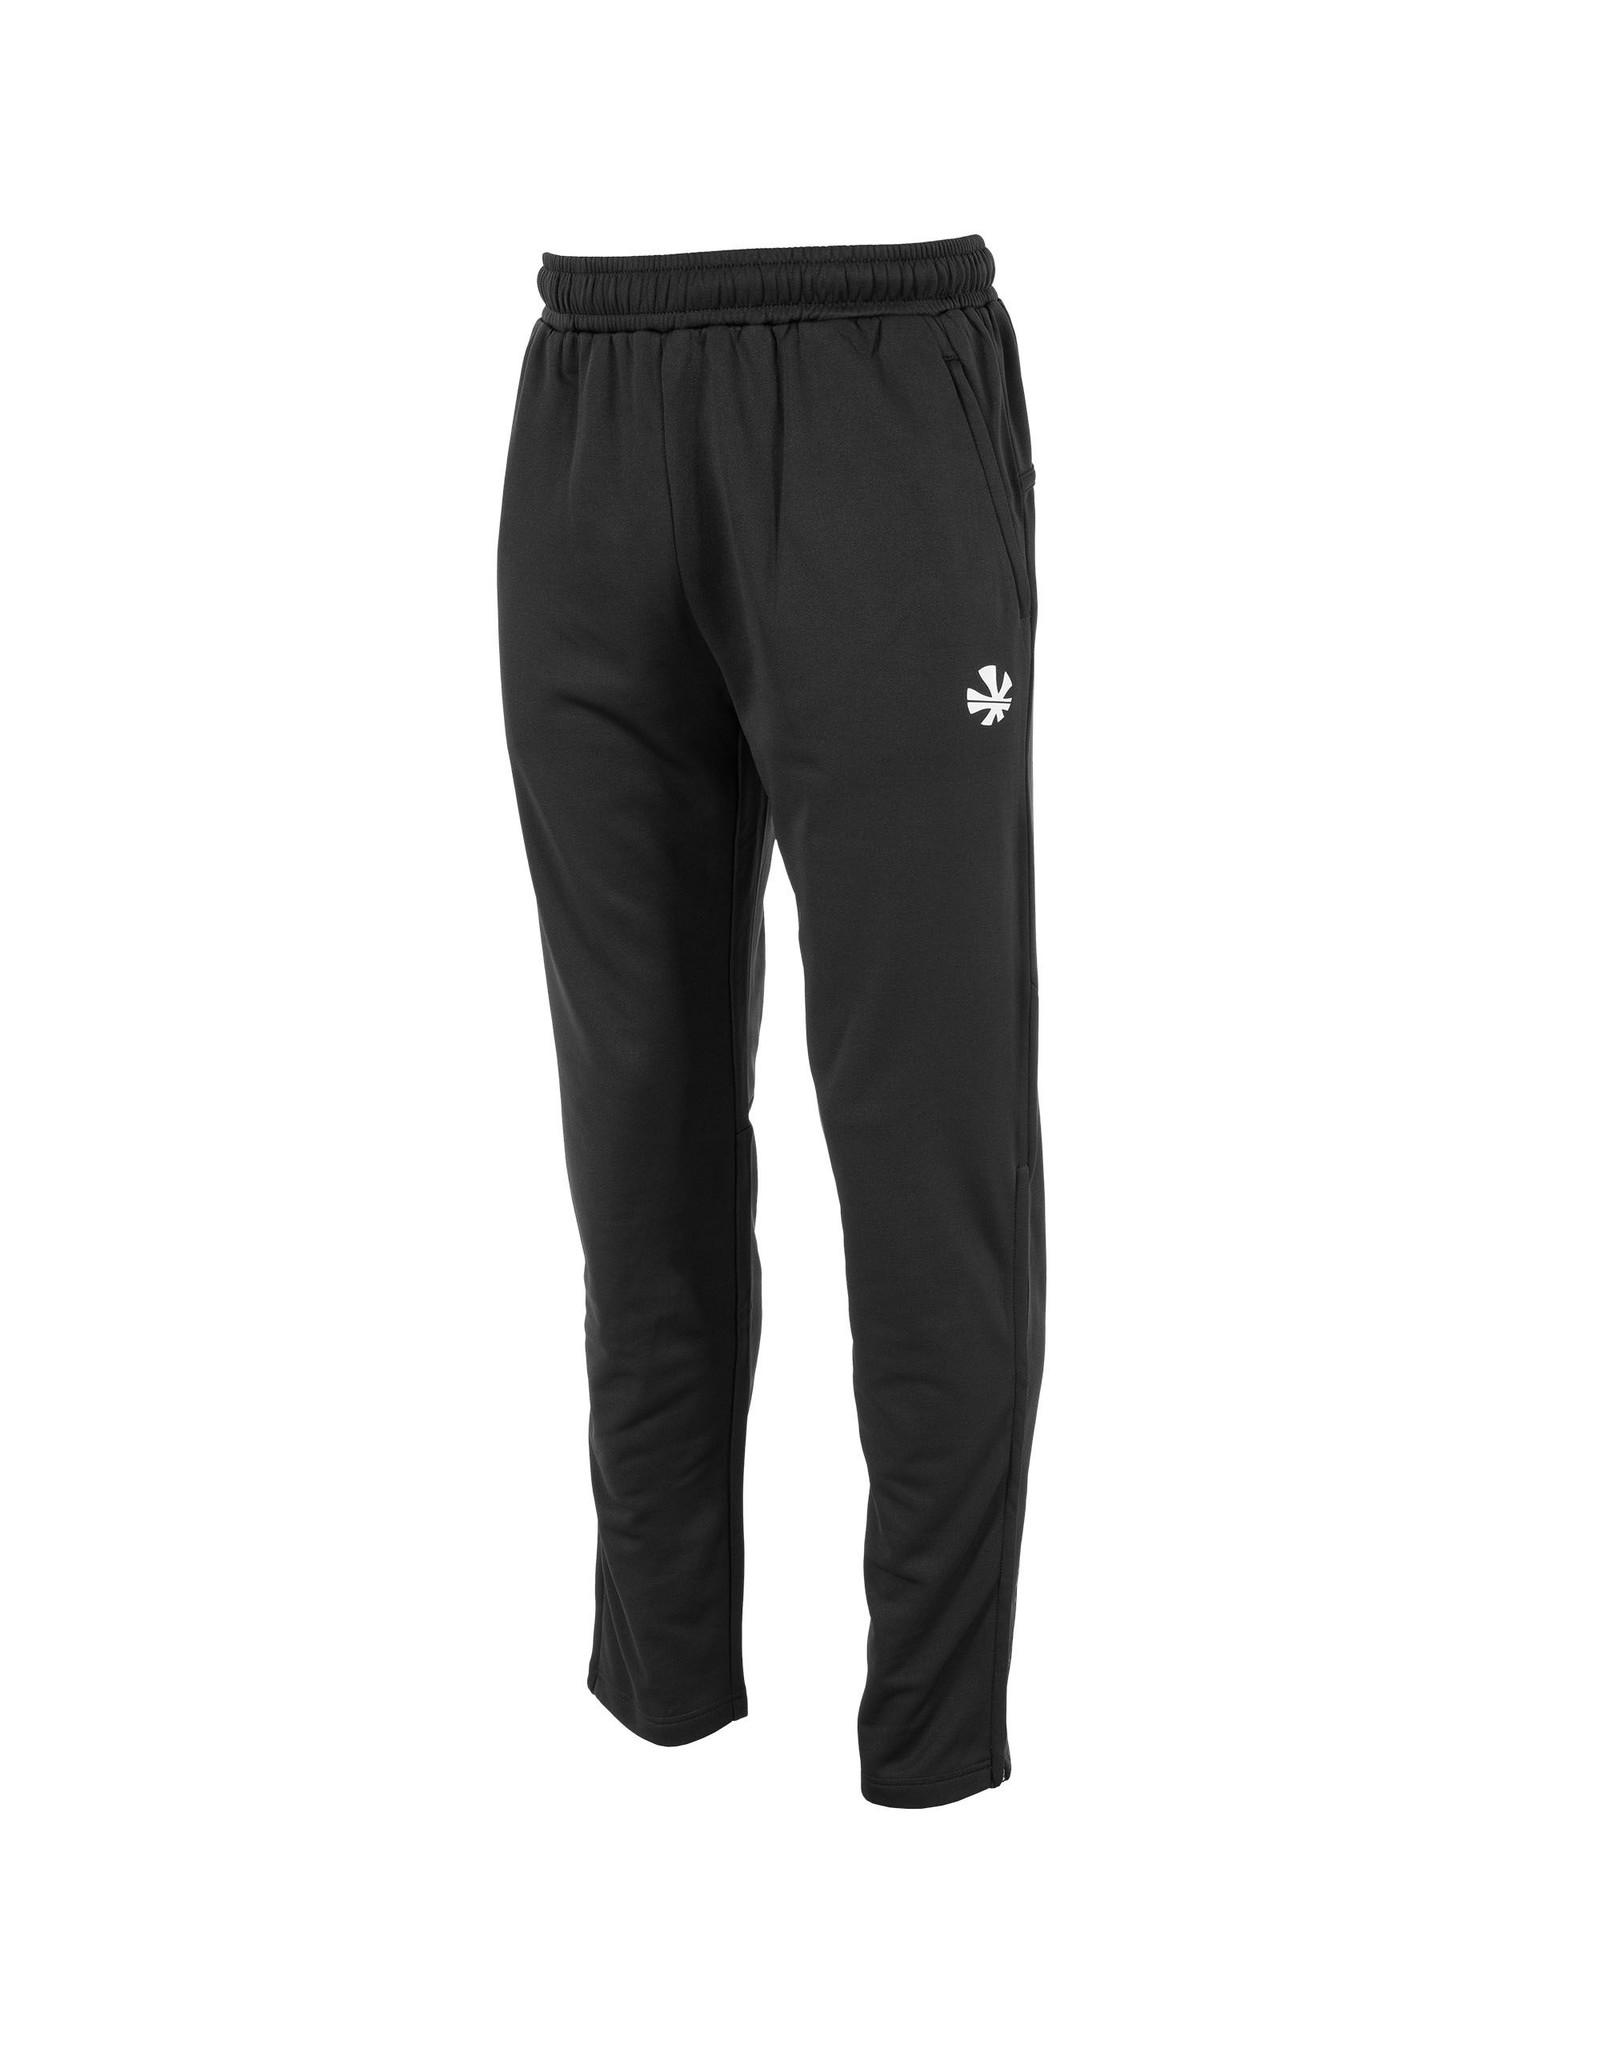 Reece Australia Icon TTS Pants-Zwart